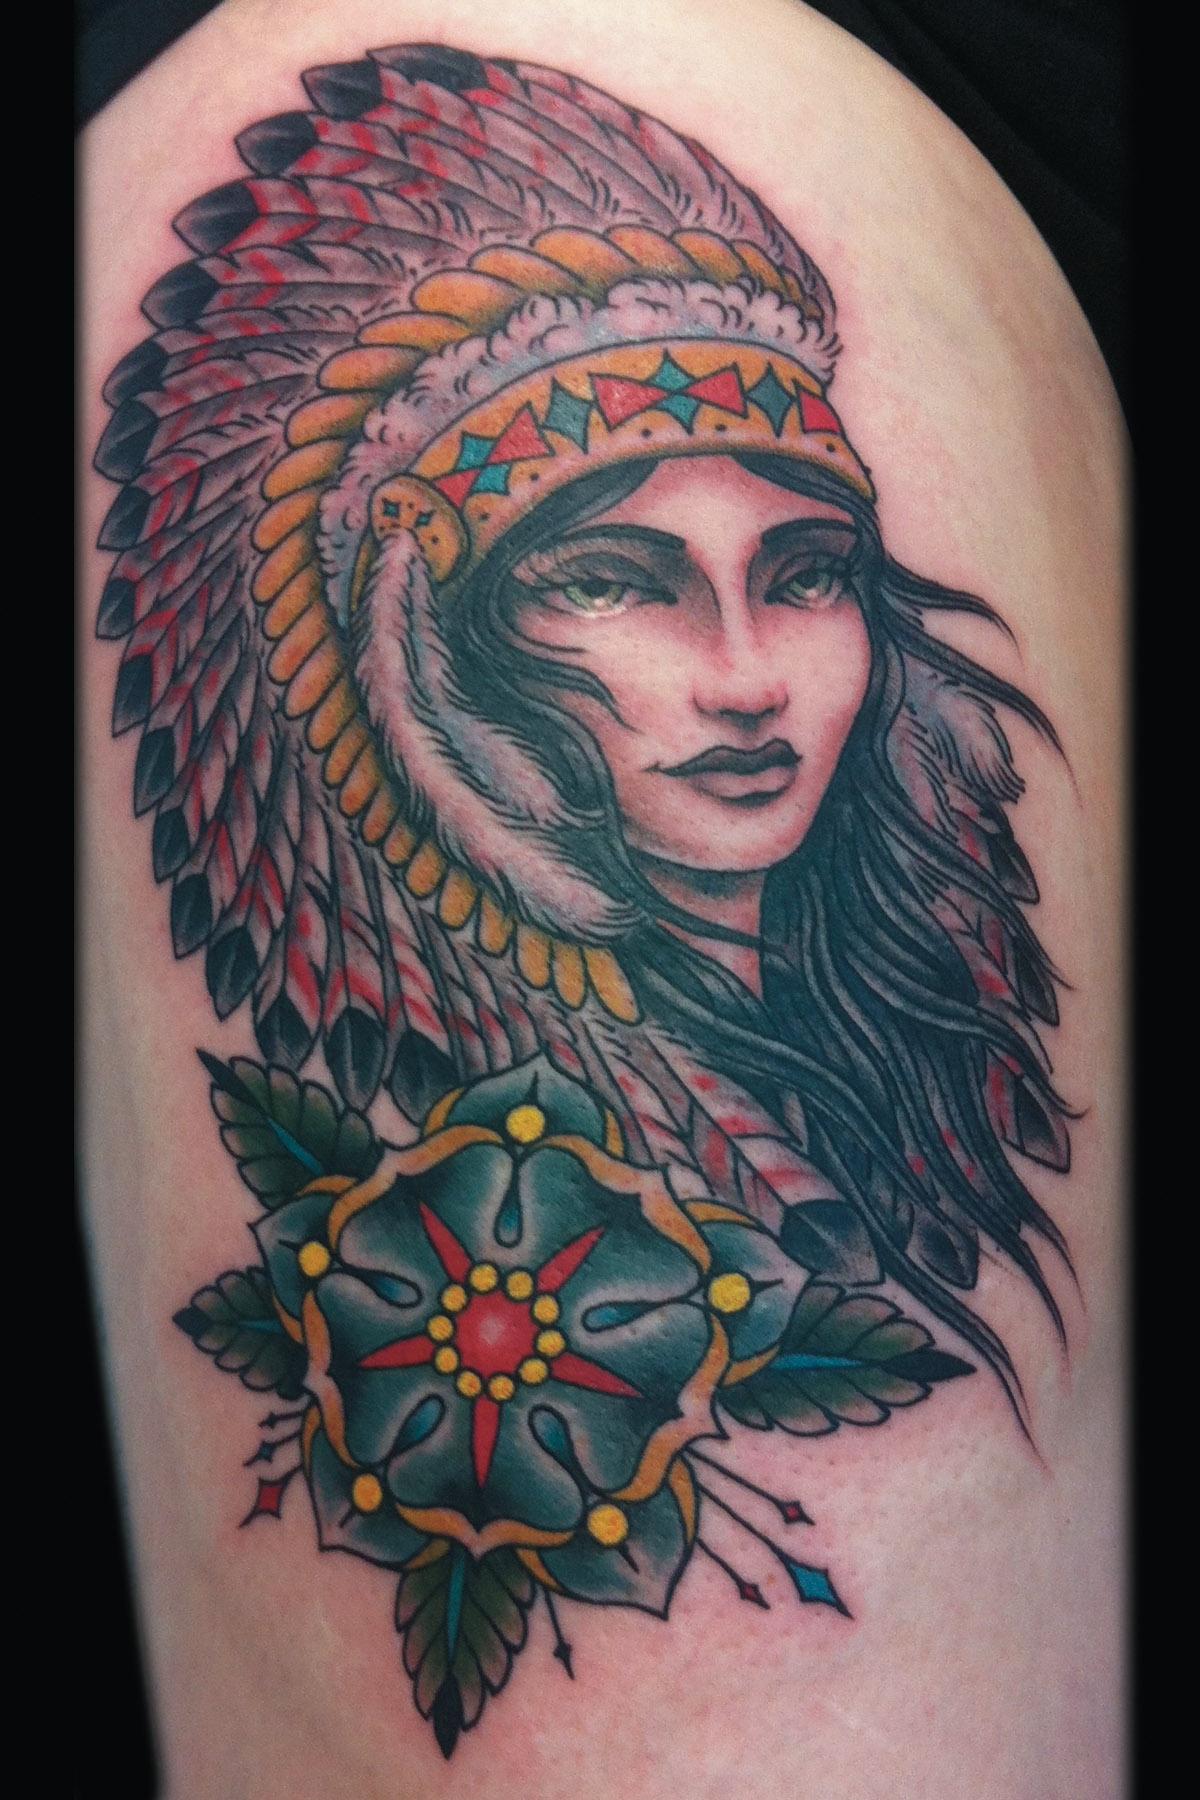 sam-yamini-dedication-tattoo-indian-girl-headdress-flower-thigh